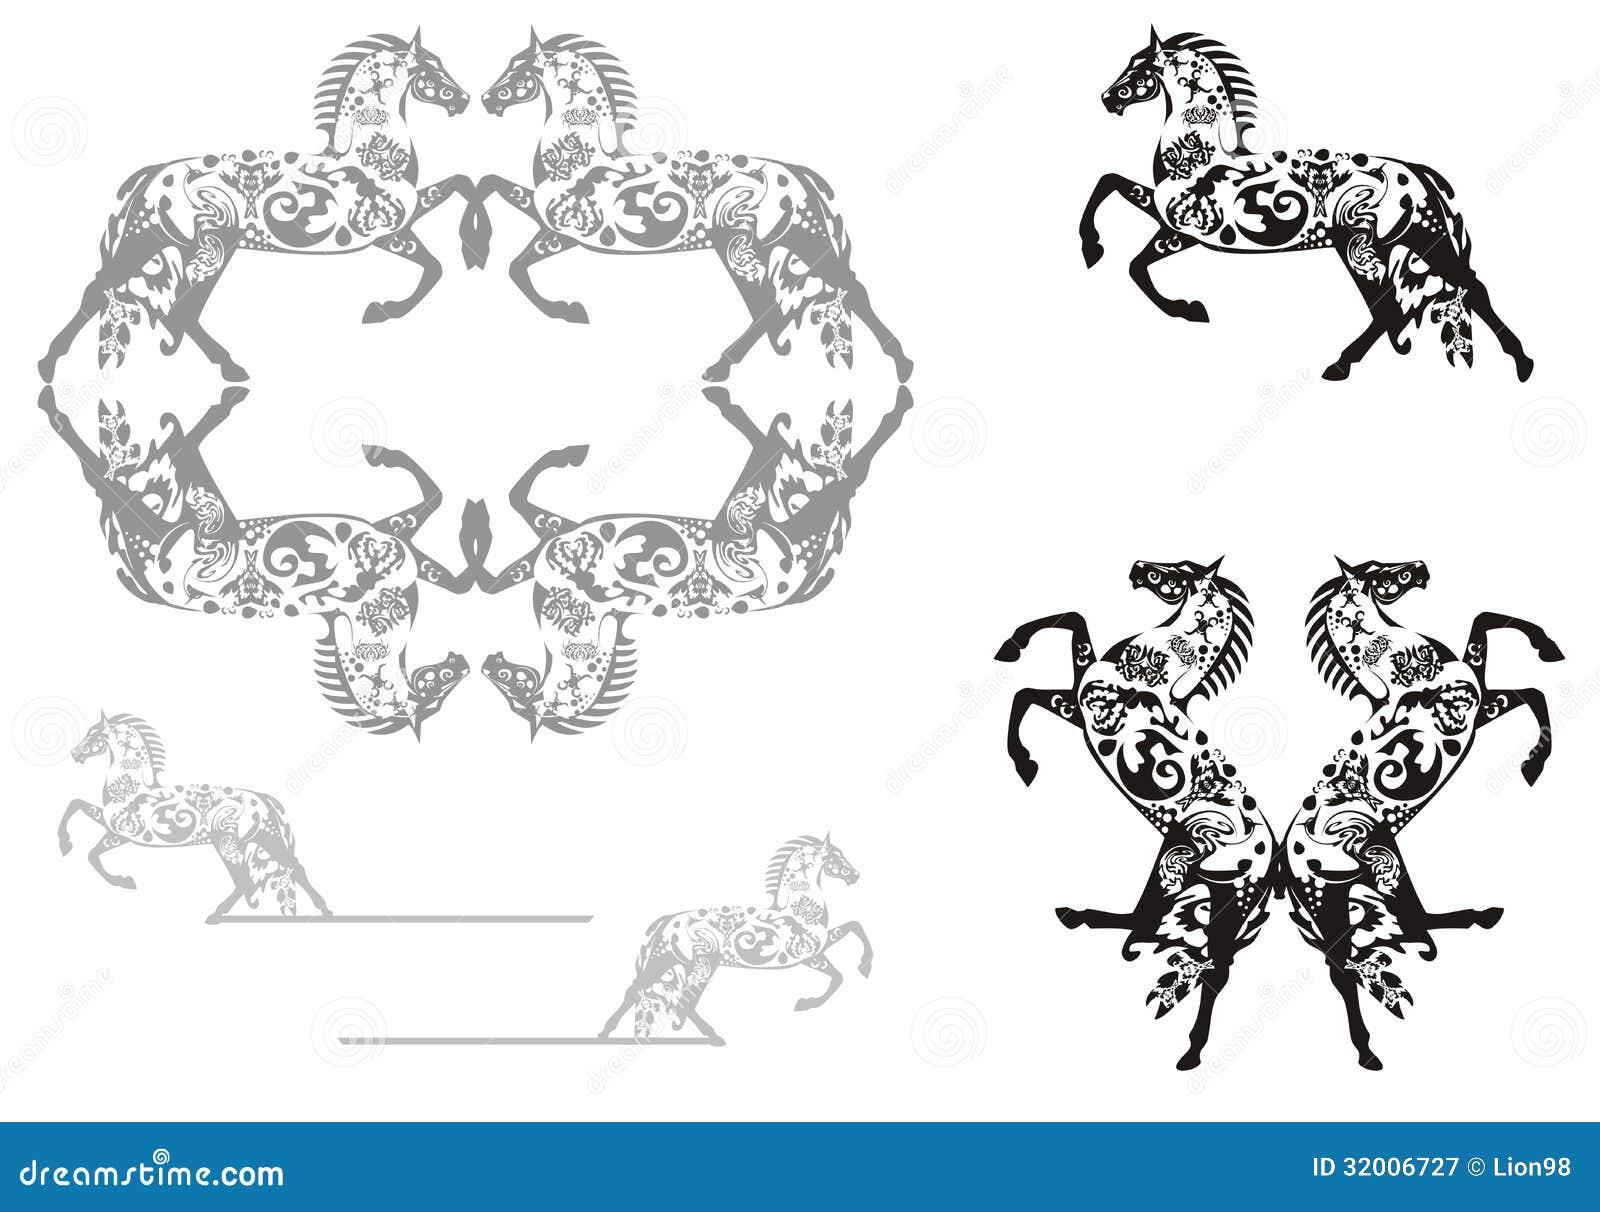 Ilustrao Stock Pomba Smbolo Da Paz Silhueta Preta Do Vetor Image52980332 besides Stock Vector Round Up Time Banner Retro Clip Art Illustration also Stickers 1 moreover Lineart Family 725262 in addition Hangyebiaozhi 435834. on horse silouette